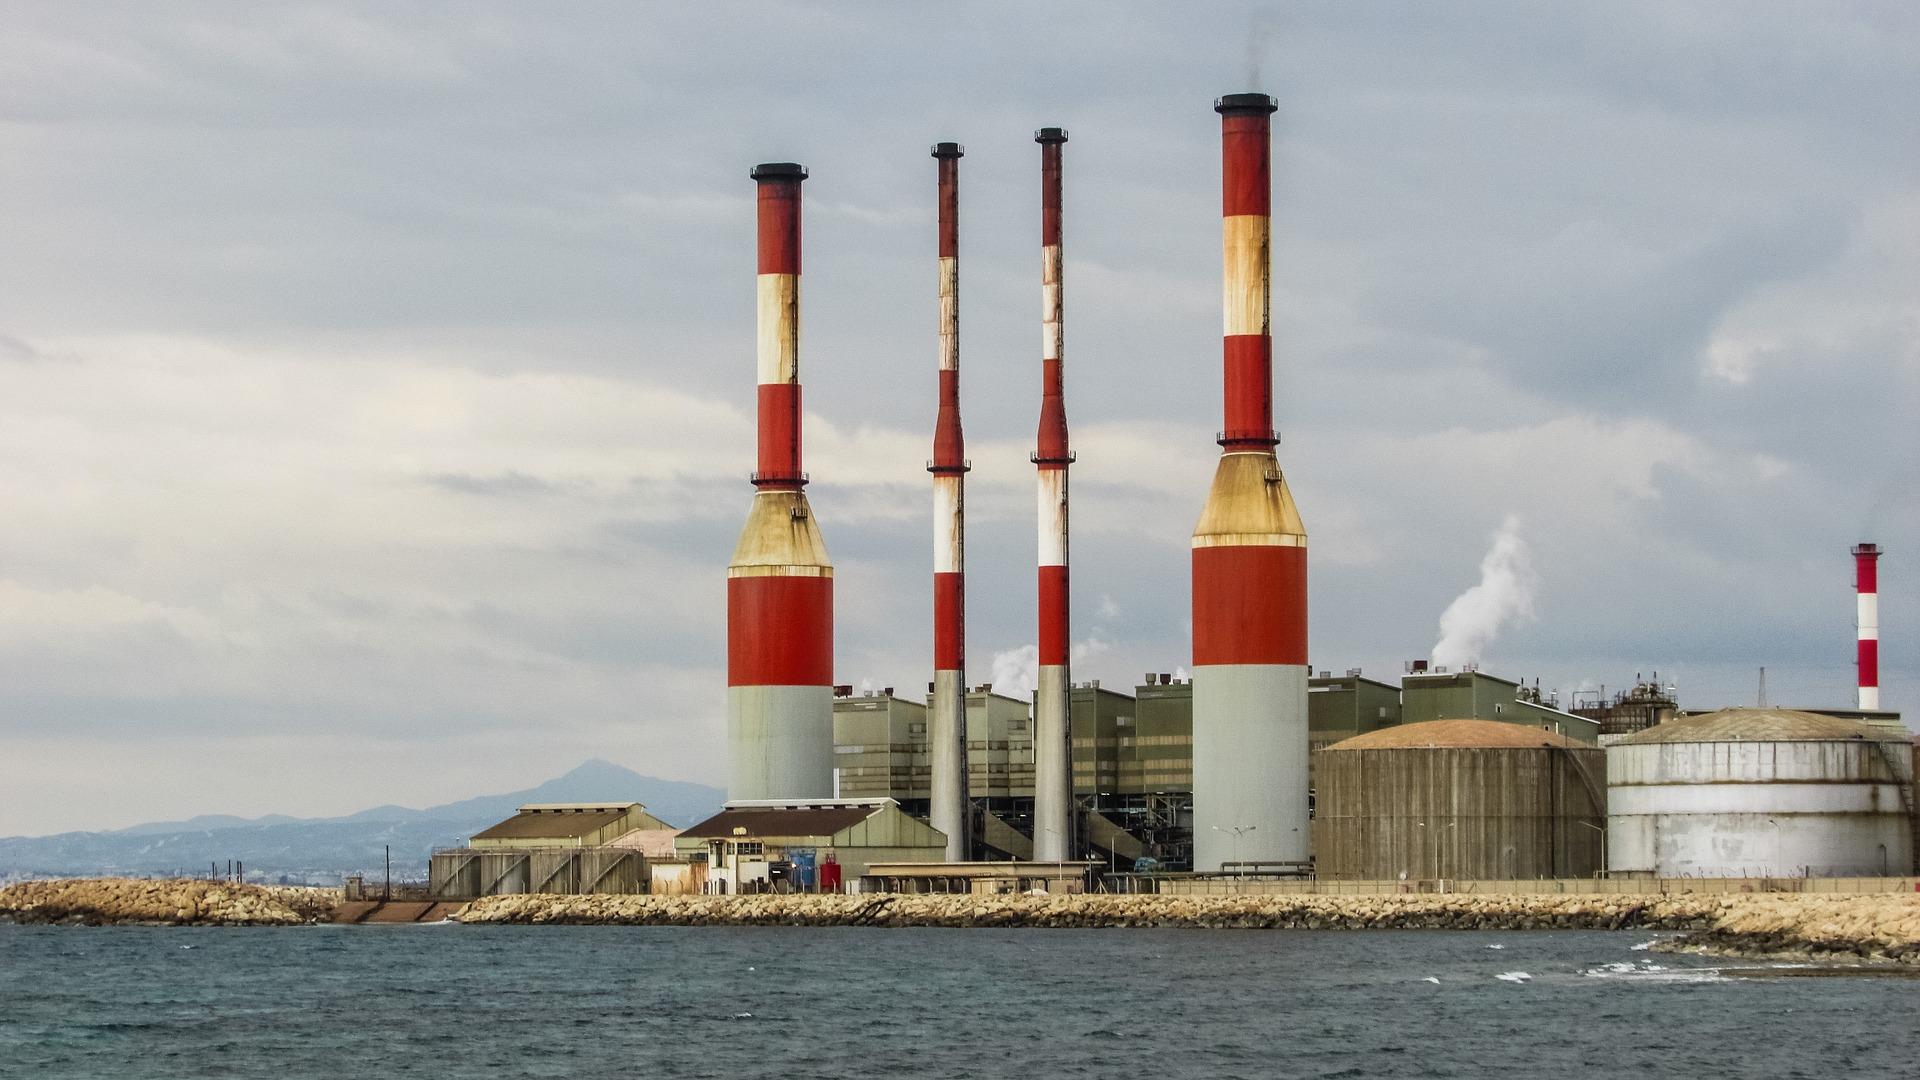 Spotlight on Bayat Power's Important New Energy Initiative